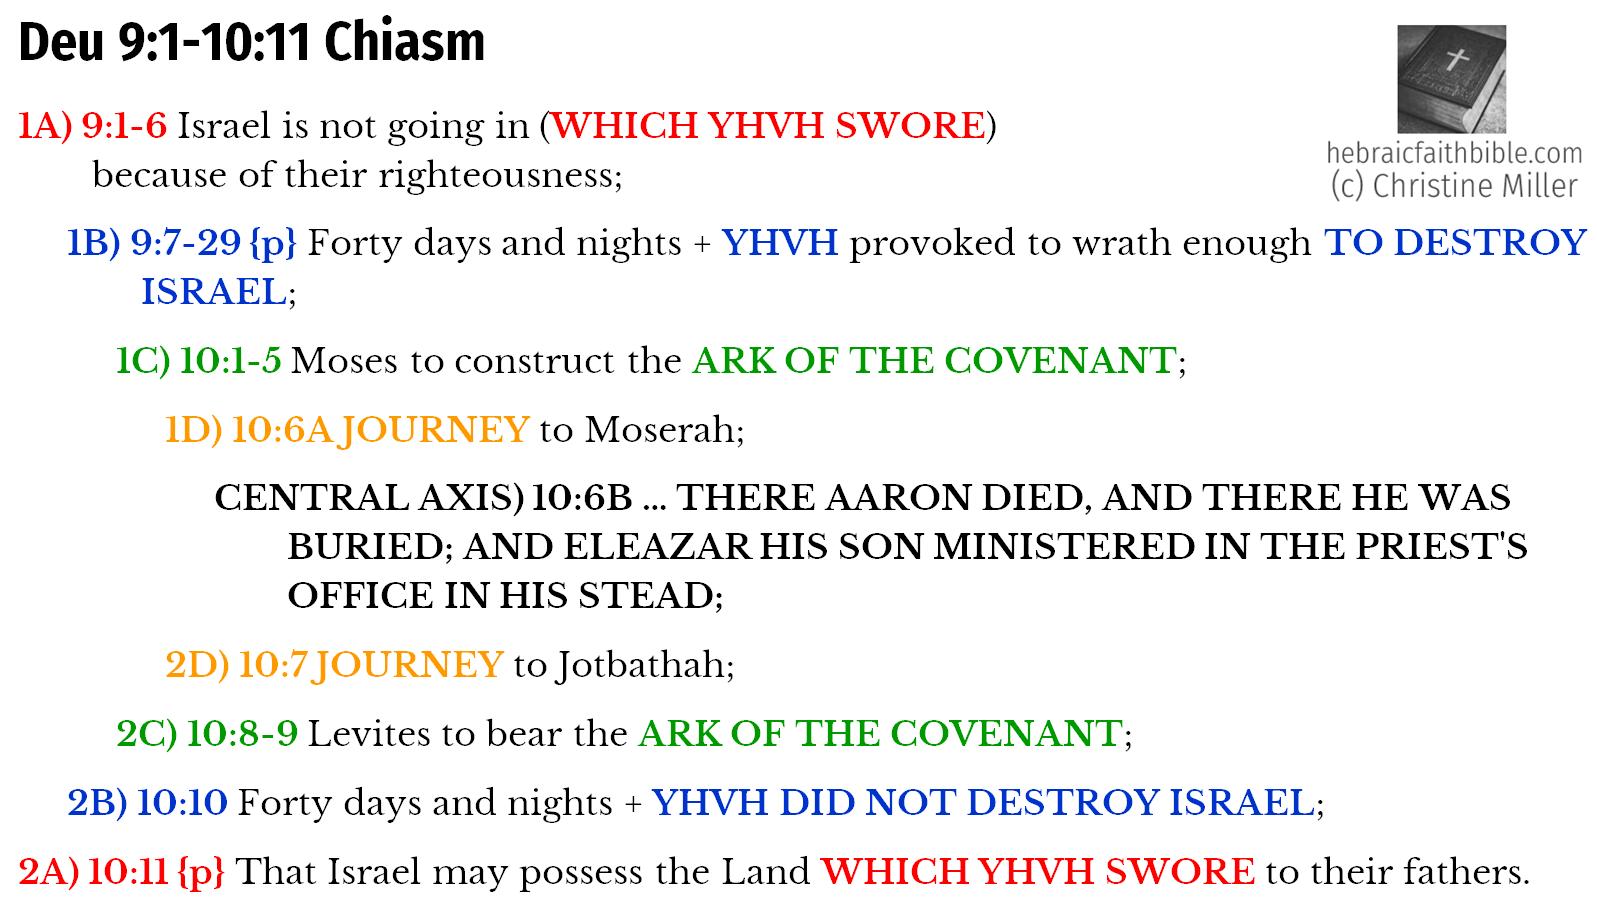 Deu 9:1-10:11 Chiasm | hebraicfaithbible.com